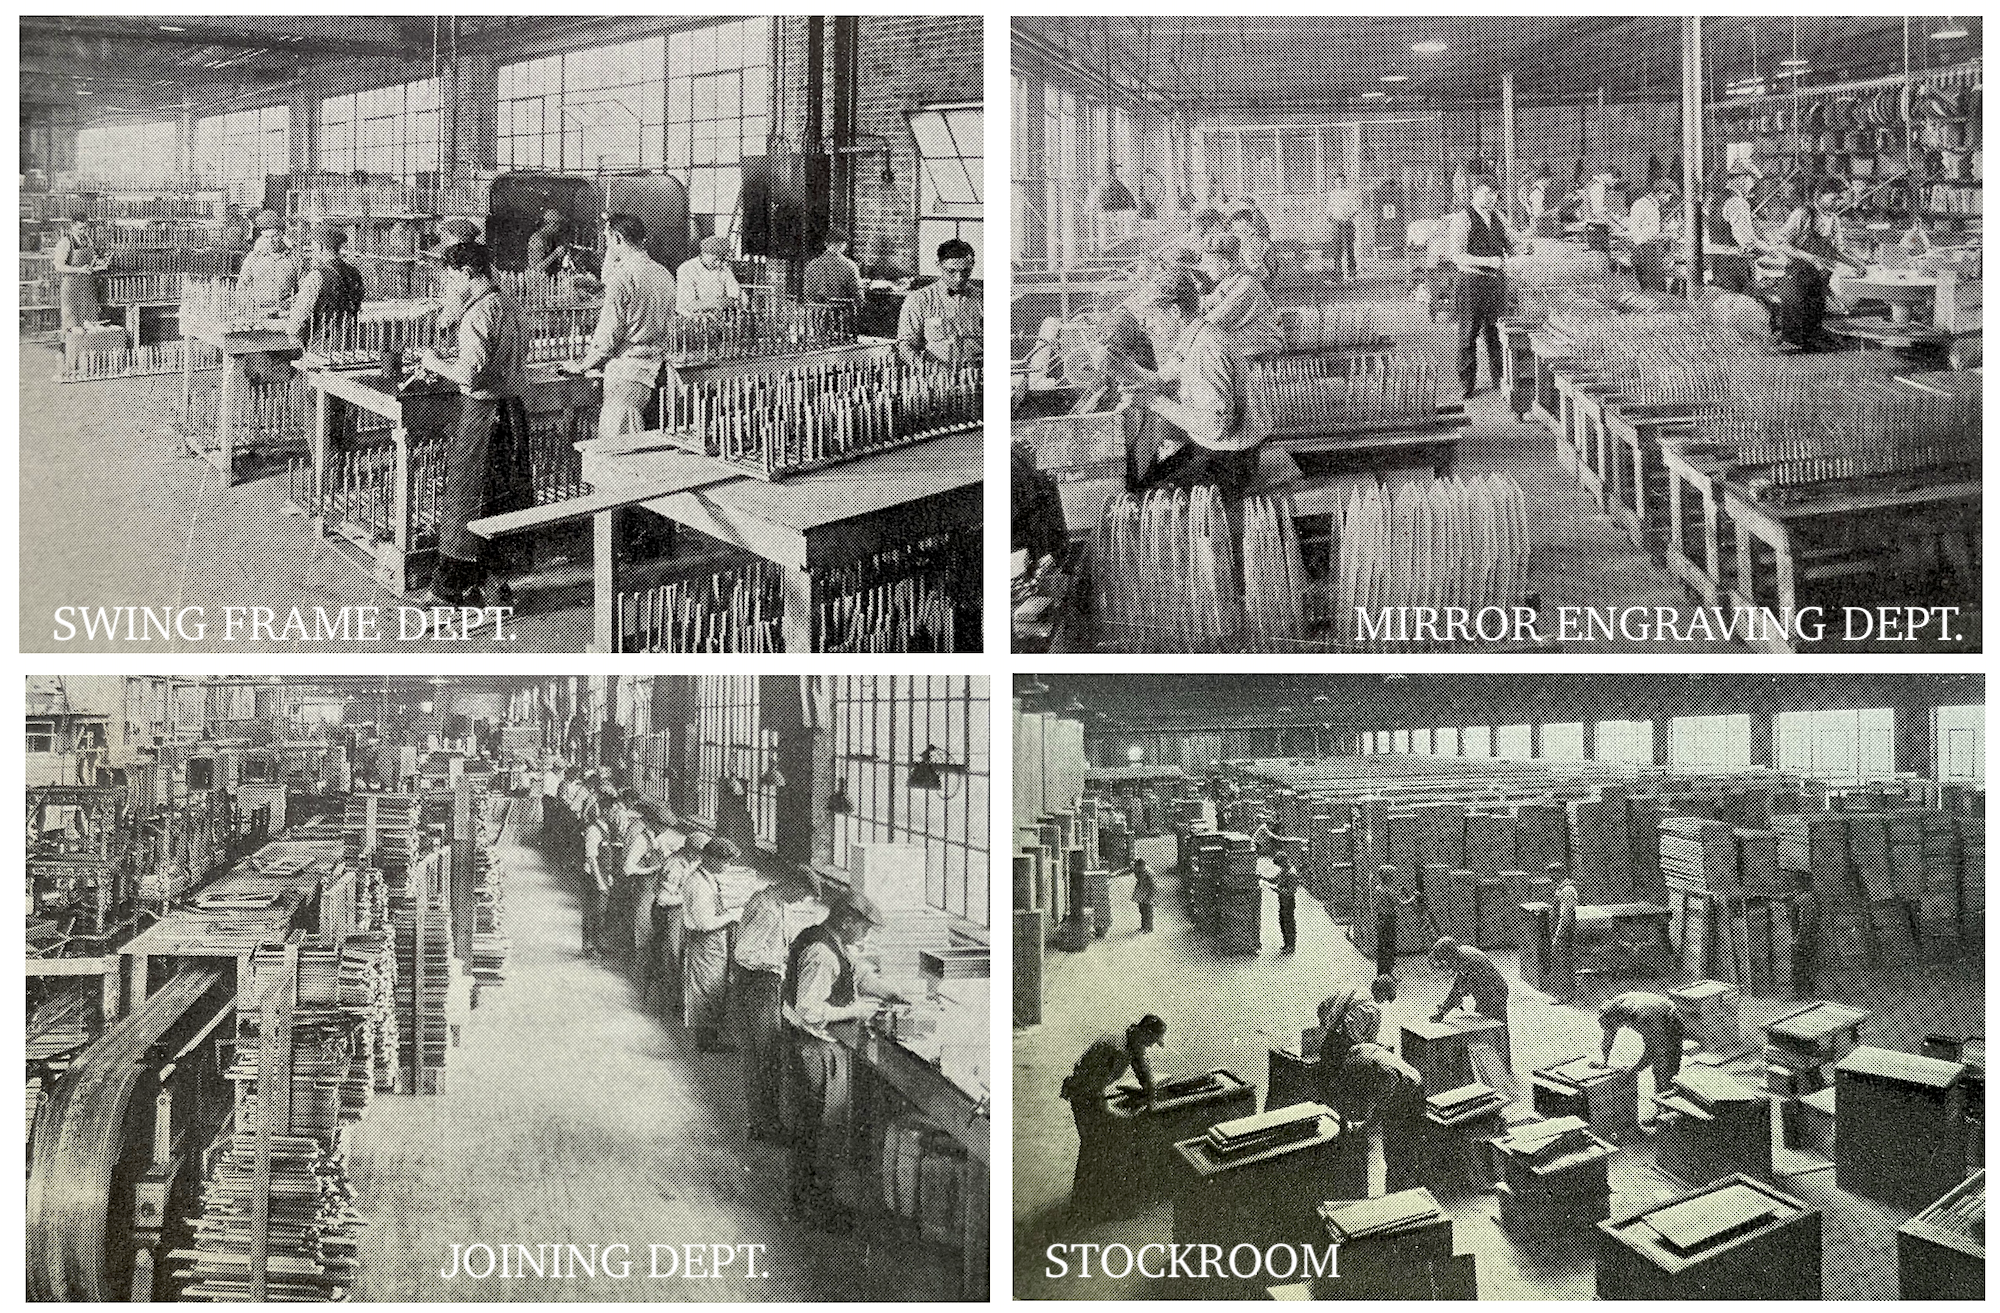 Borin factory workers